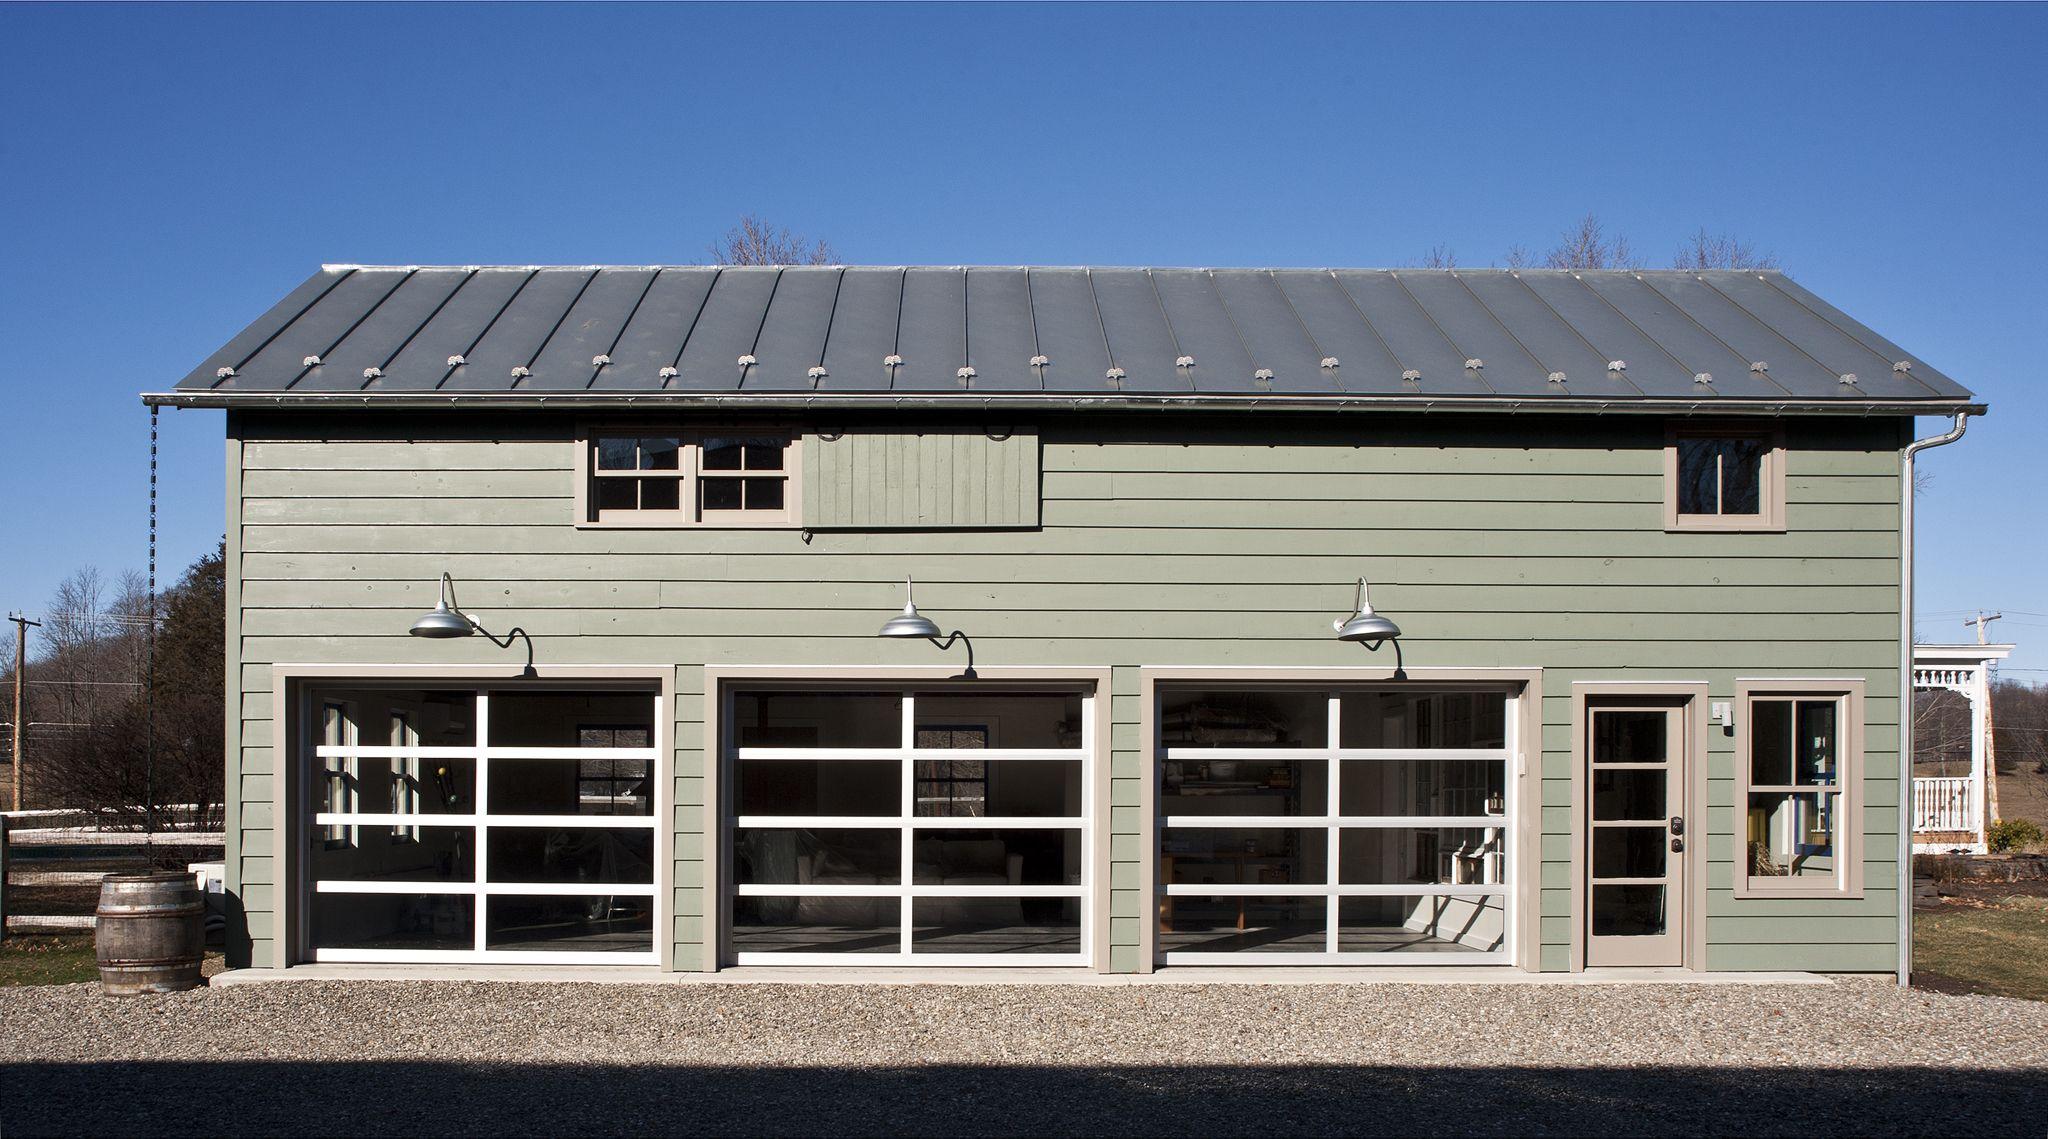 Historic Barn Conversion Into Artist Studio With Glass Garage Doors And Zinc Roof Glass Garage Door Contemporary Barn Zinc Roof